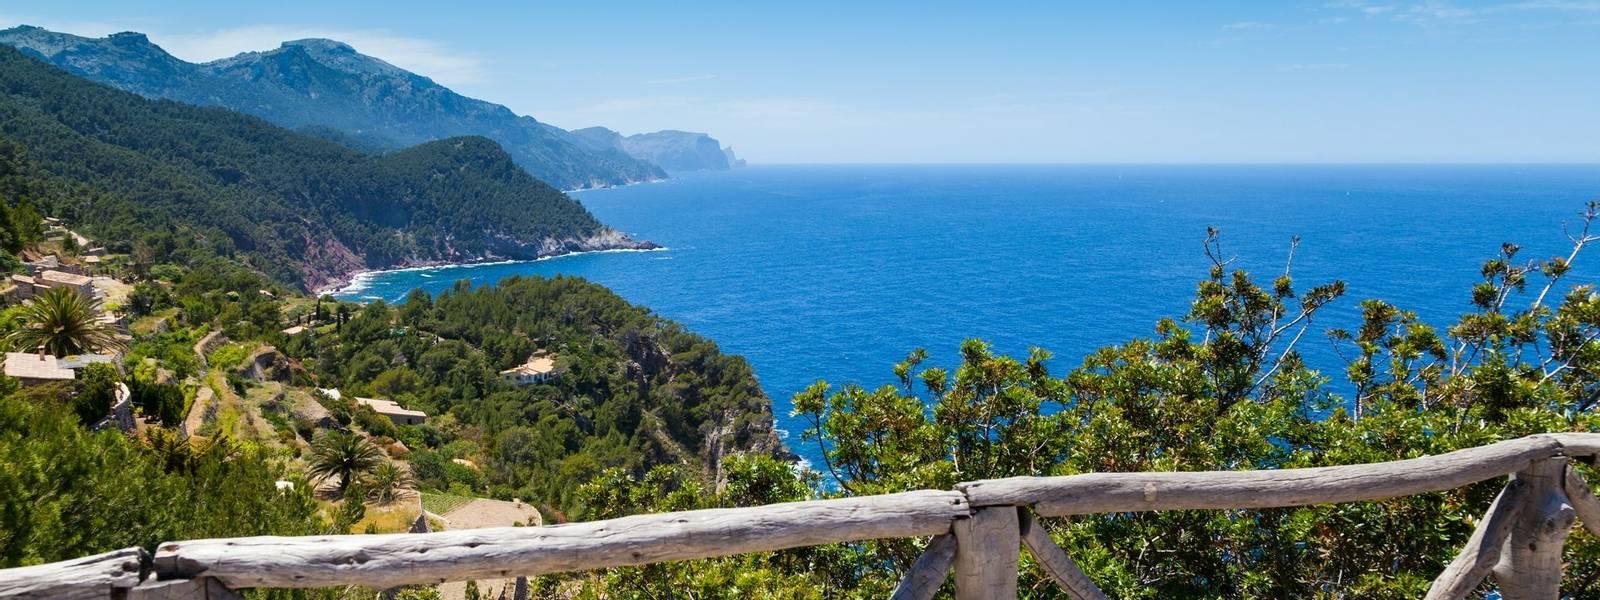 Tramuntana Mountain Range in Majorca North Coast from Verger Viewpoint